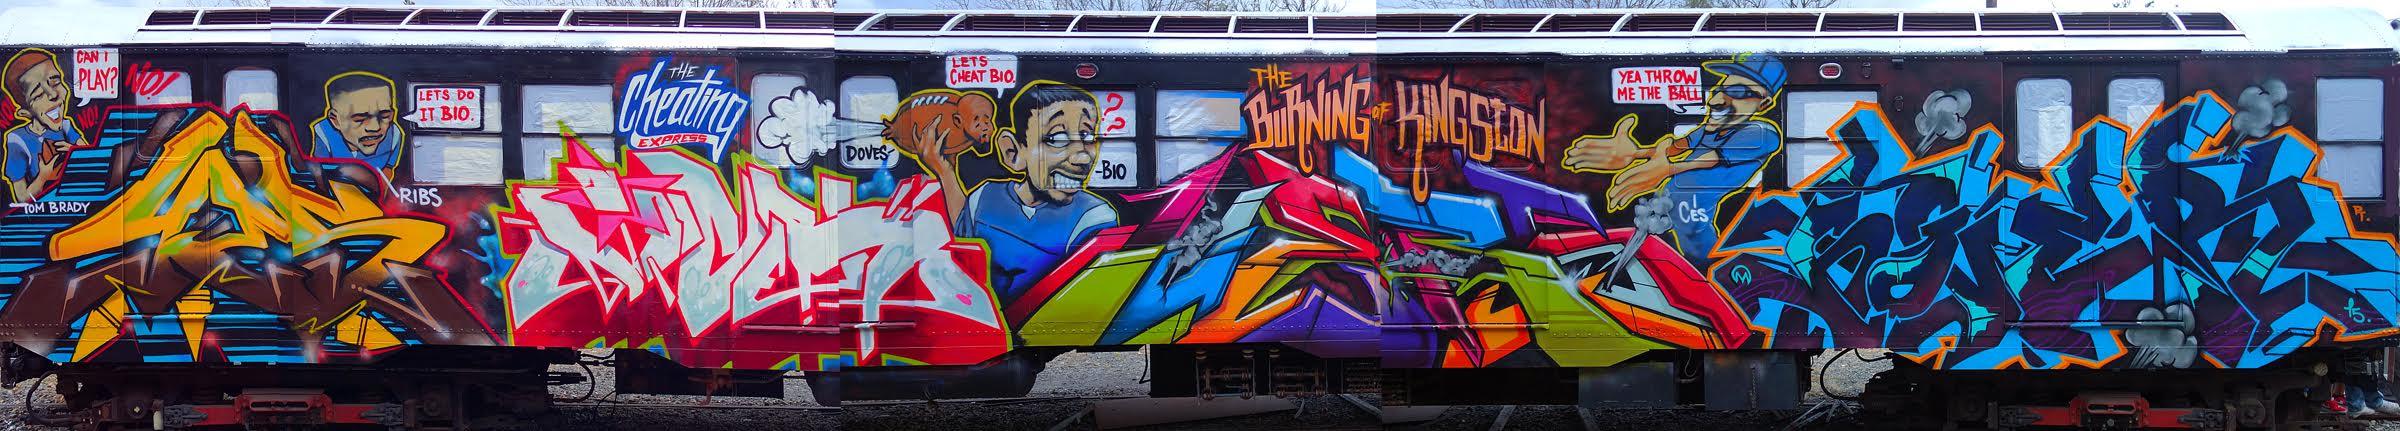 The Burning Of Kingston 2, 2015.